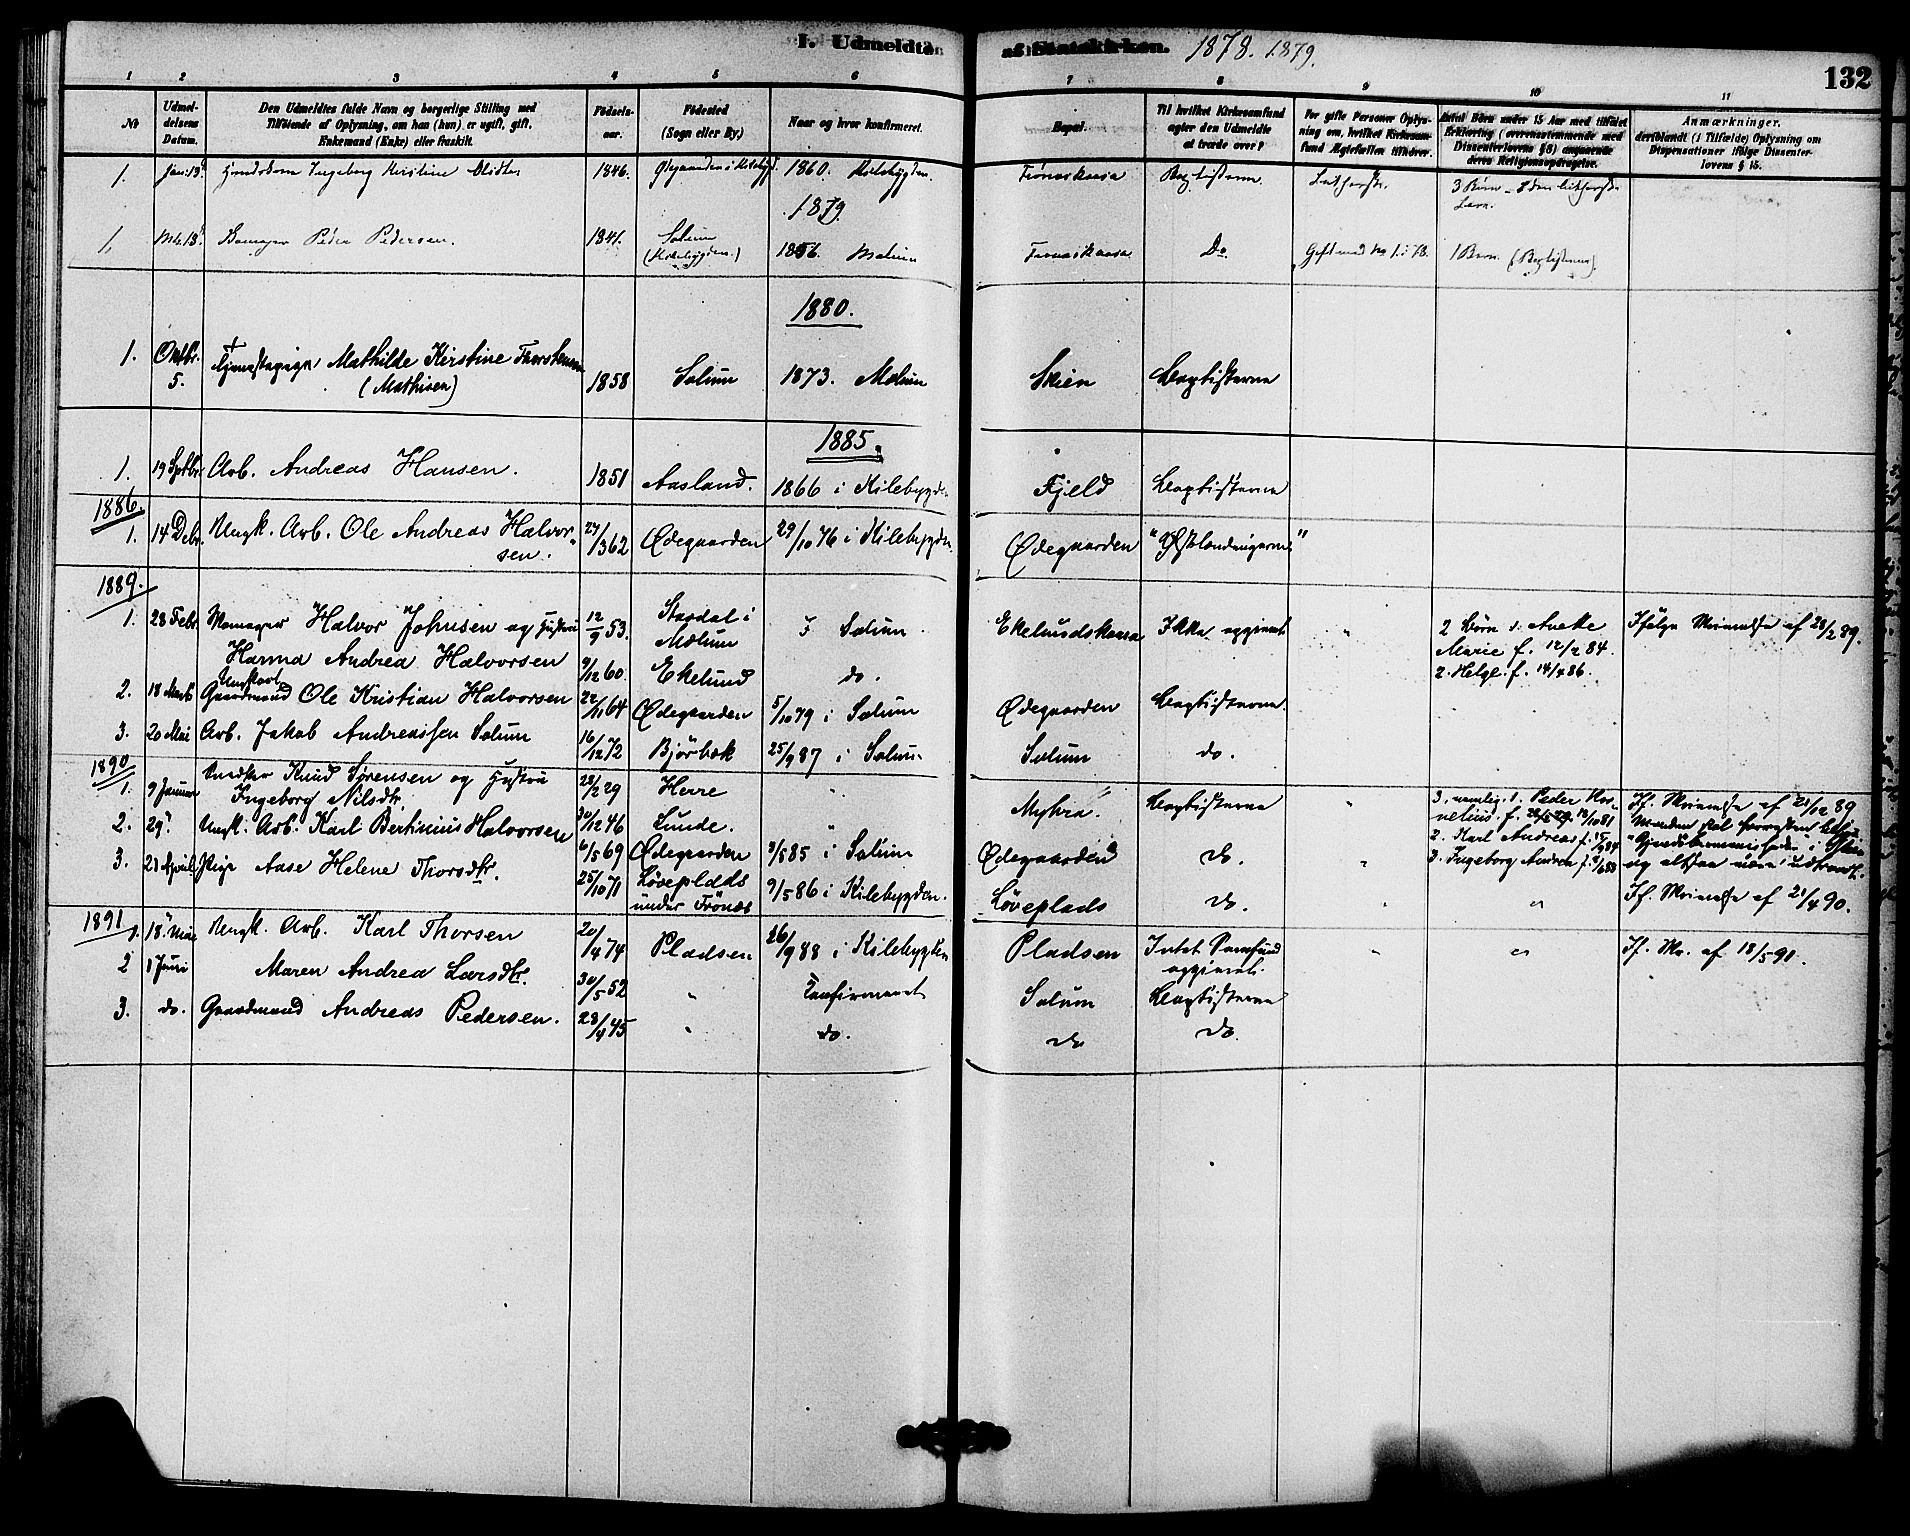 SAKO, Solum kirkebøker, F/Fc/L0001: Ministerialbok nr. III 1, 1877-1891, s. 132